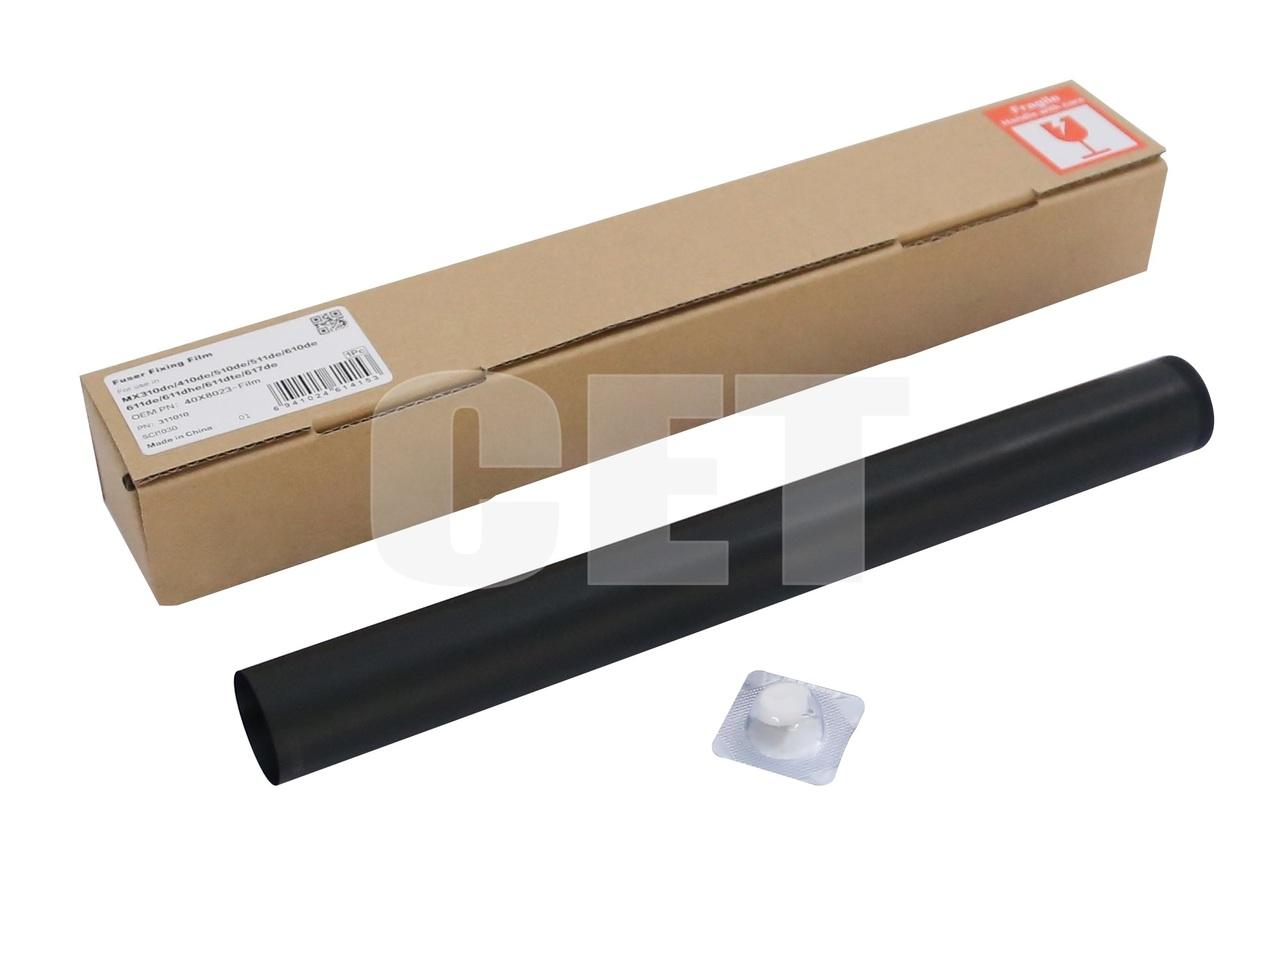 Термопленка 40X8023-Film для LEXMARKMX317dn/MX510de/MS417dn/MX417de (CET), CET311010